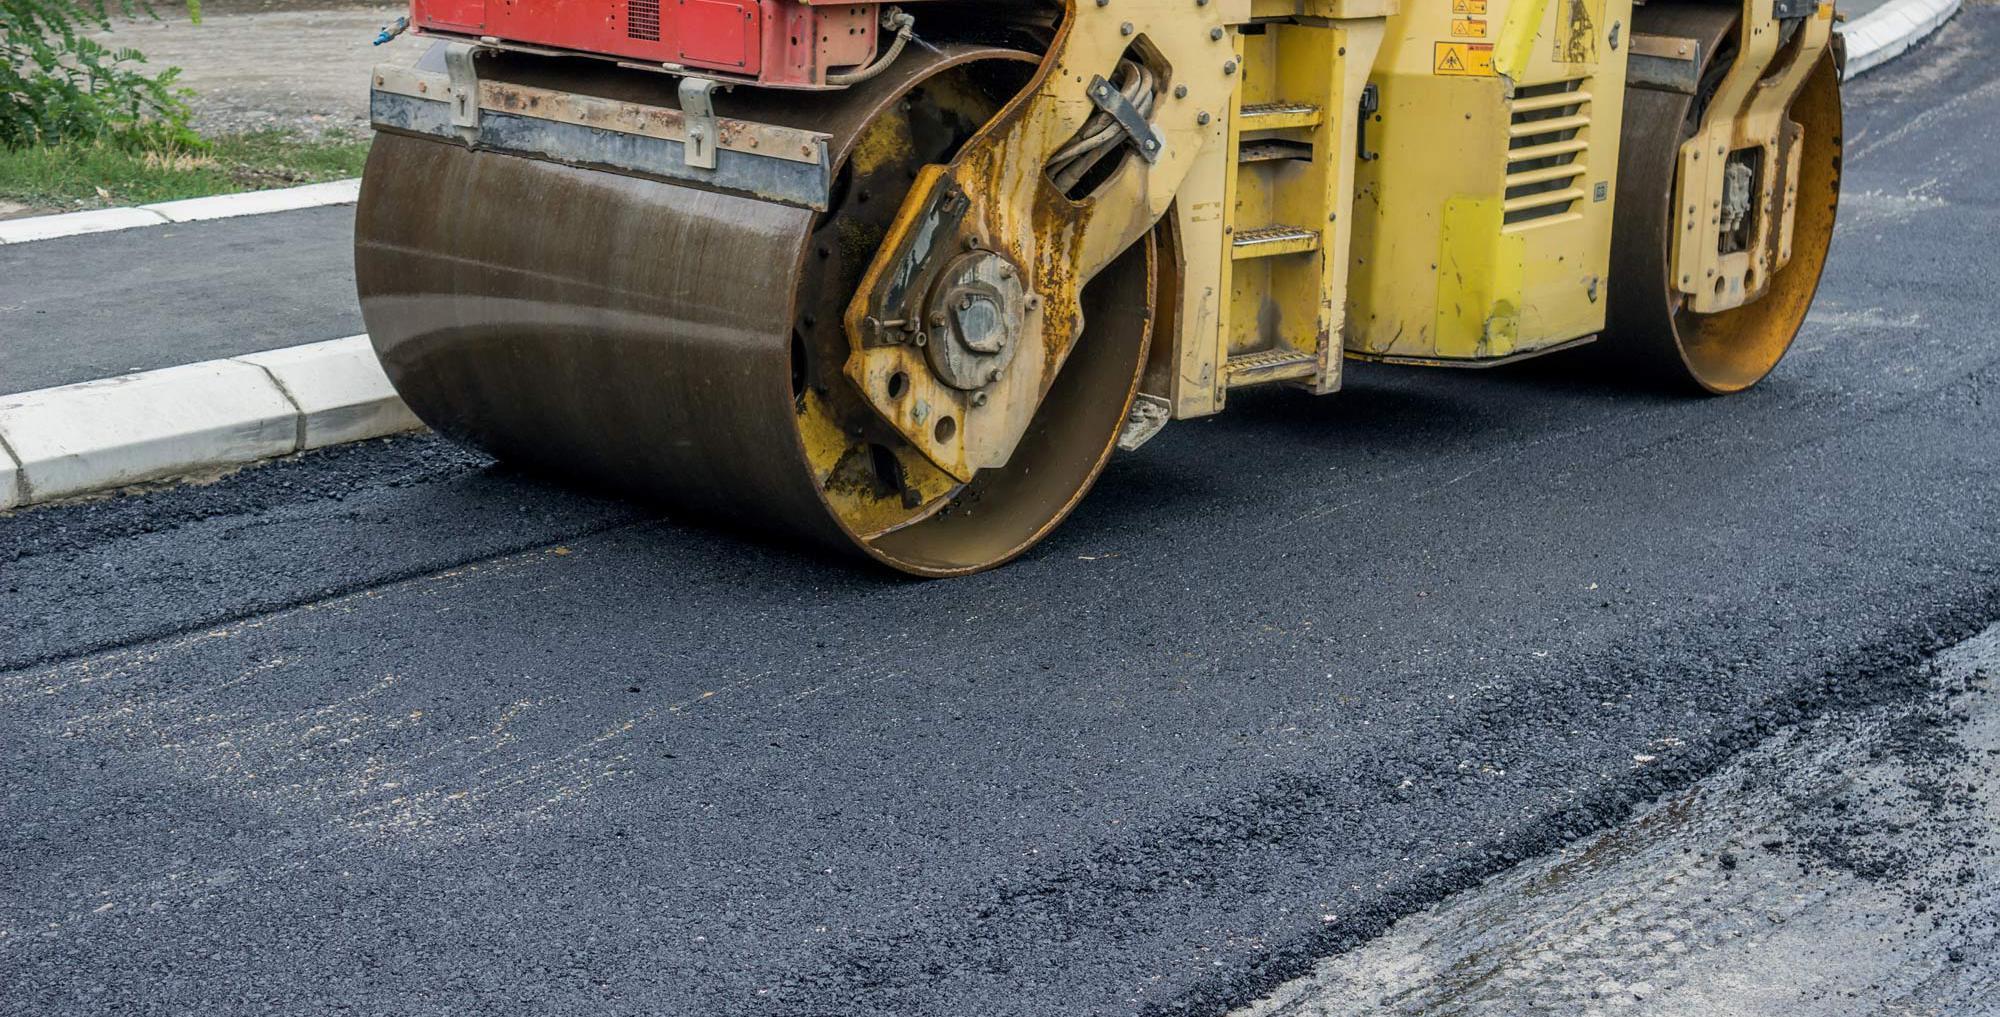 Equipment for asphalt services in Edwards, CO